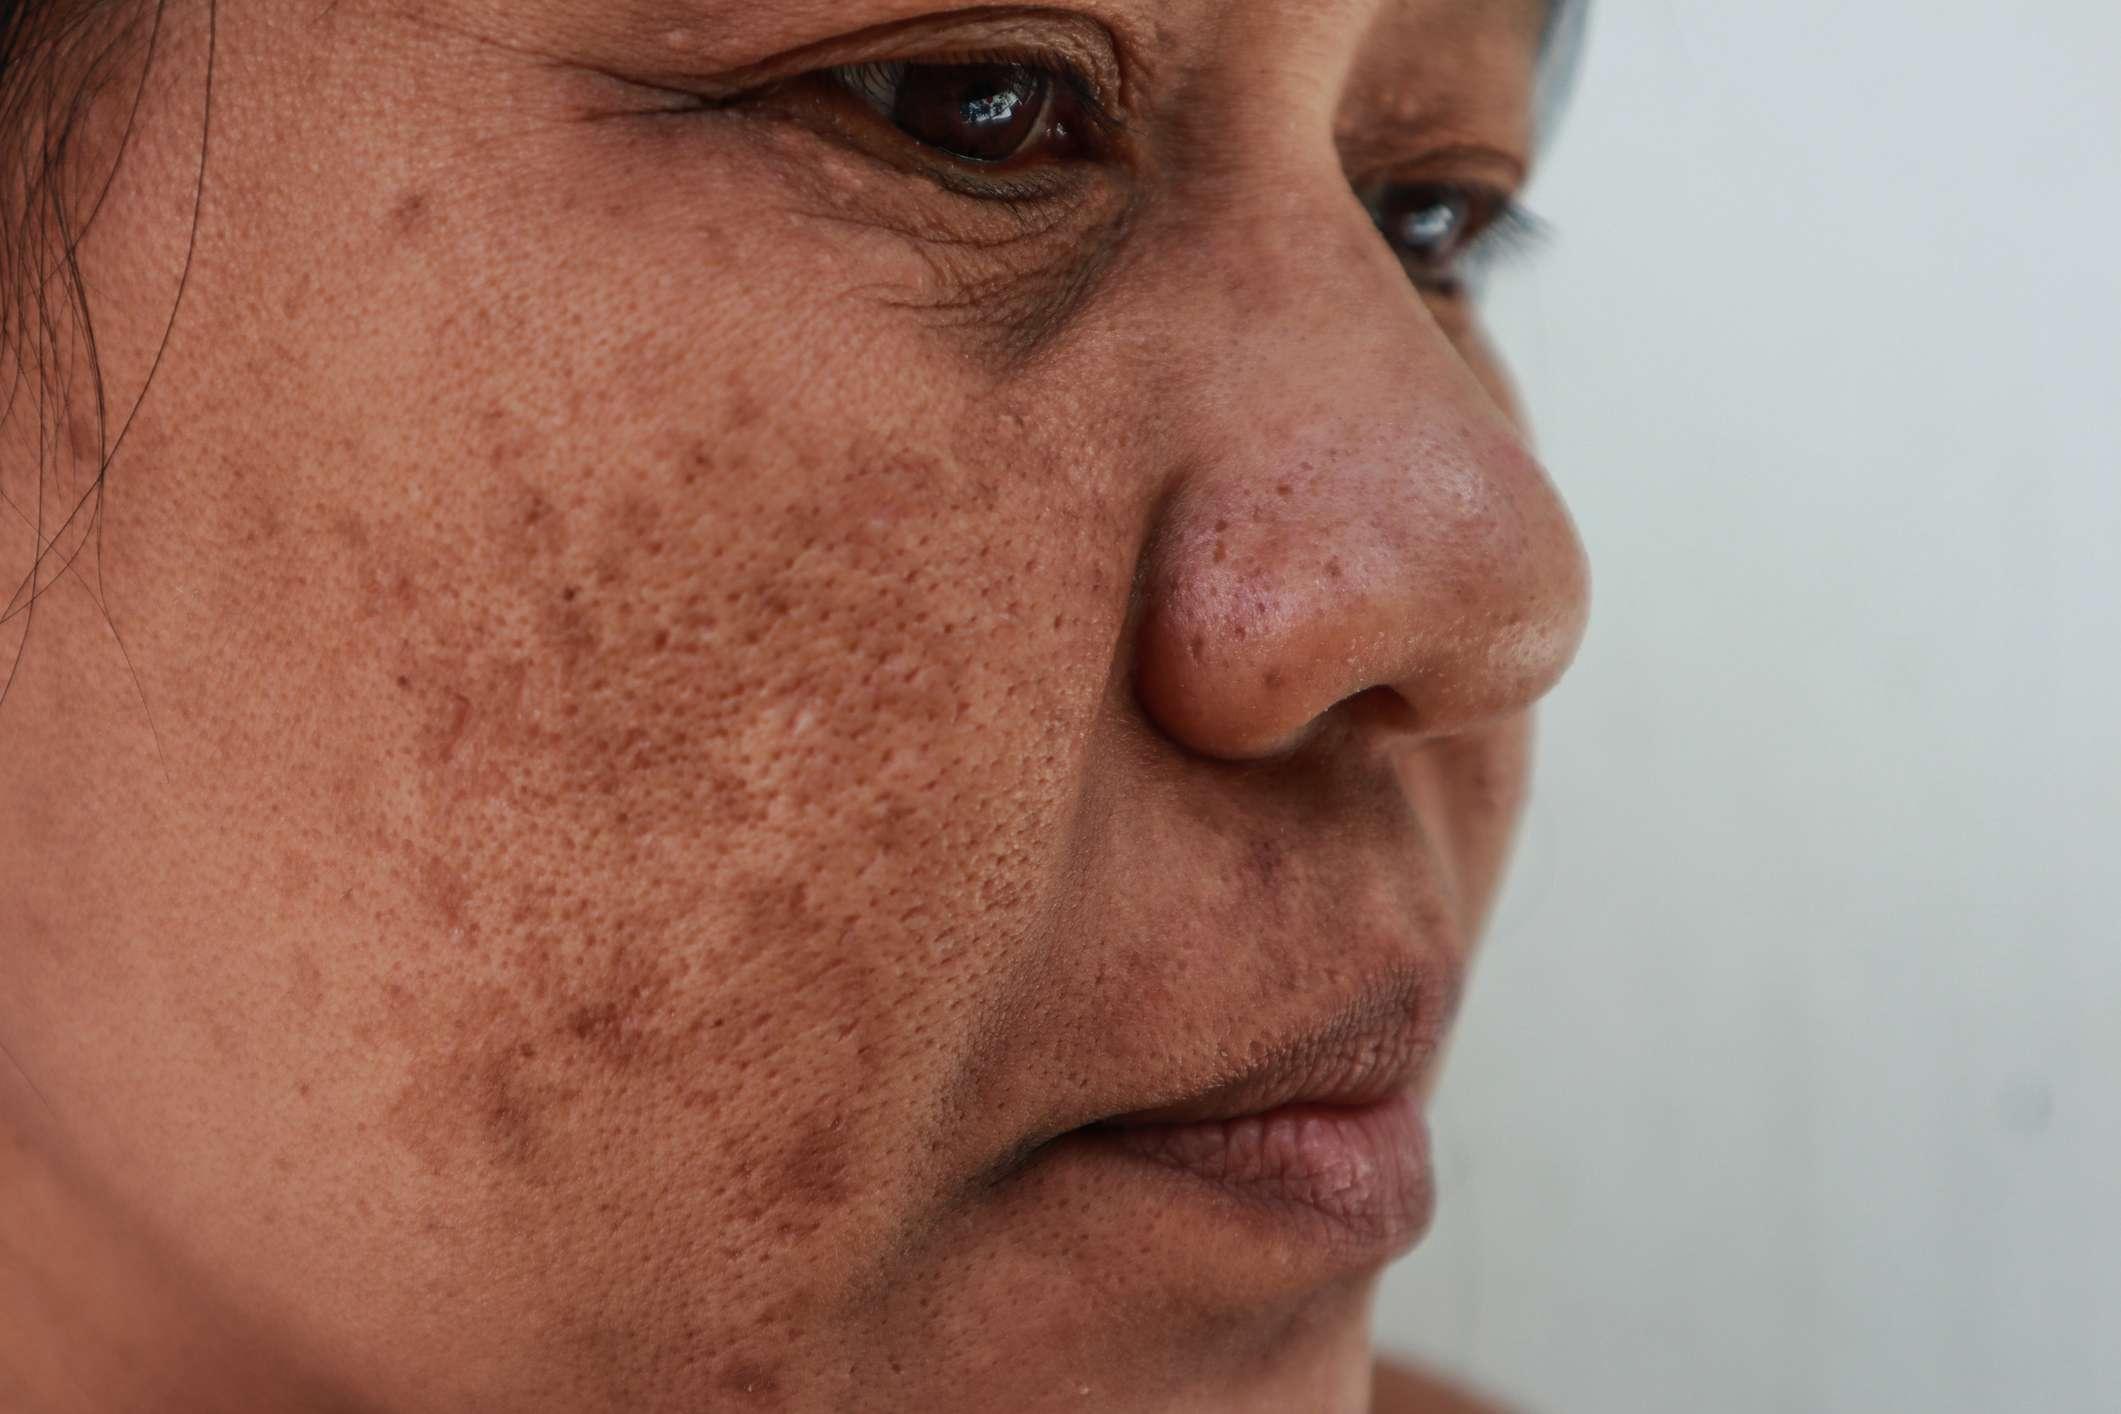 Skin problem, Closeup skin face asian women with spot melasma.